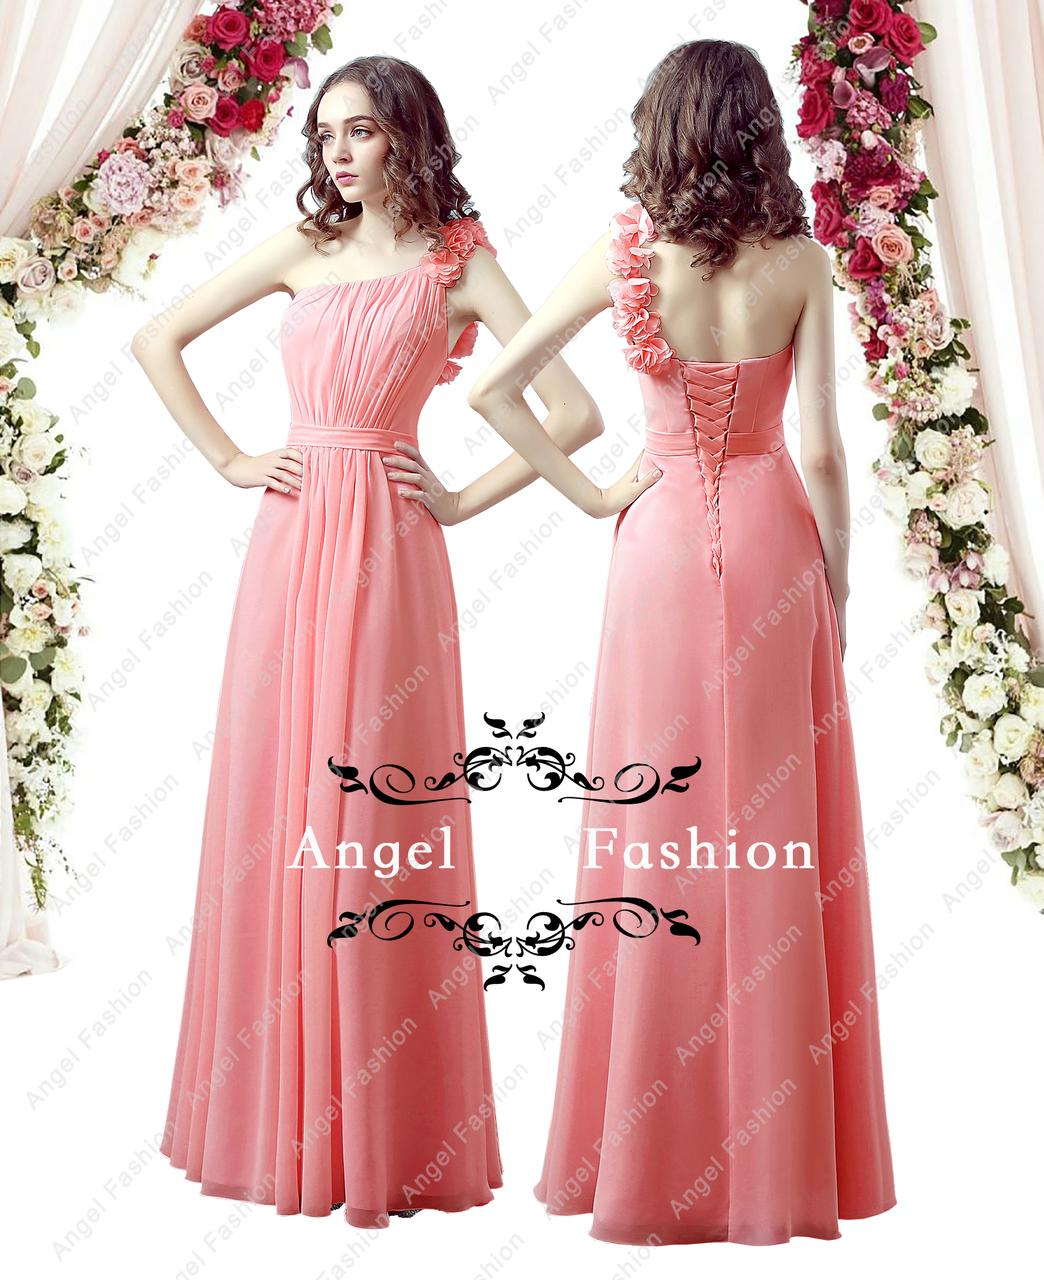 815cc7b4836 A-Line Princess Full-Length Chiffon Evening Prom Bridesmaid Dress - Angel  Fashion ltd